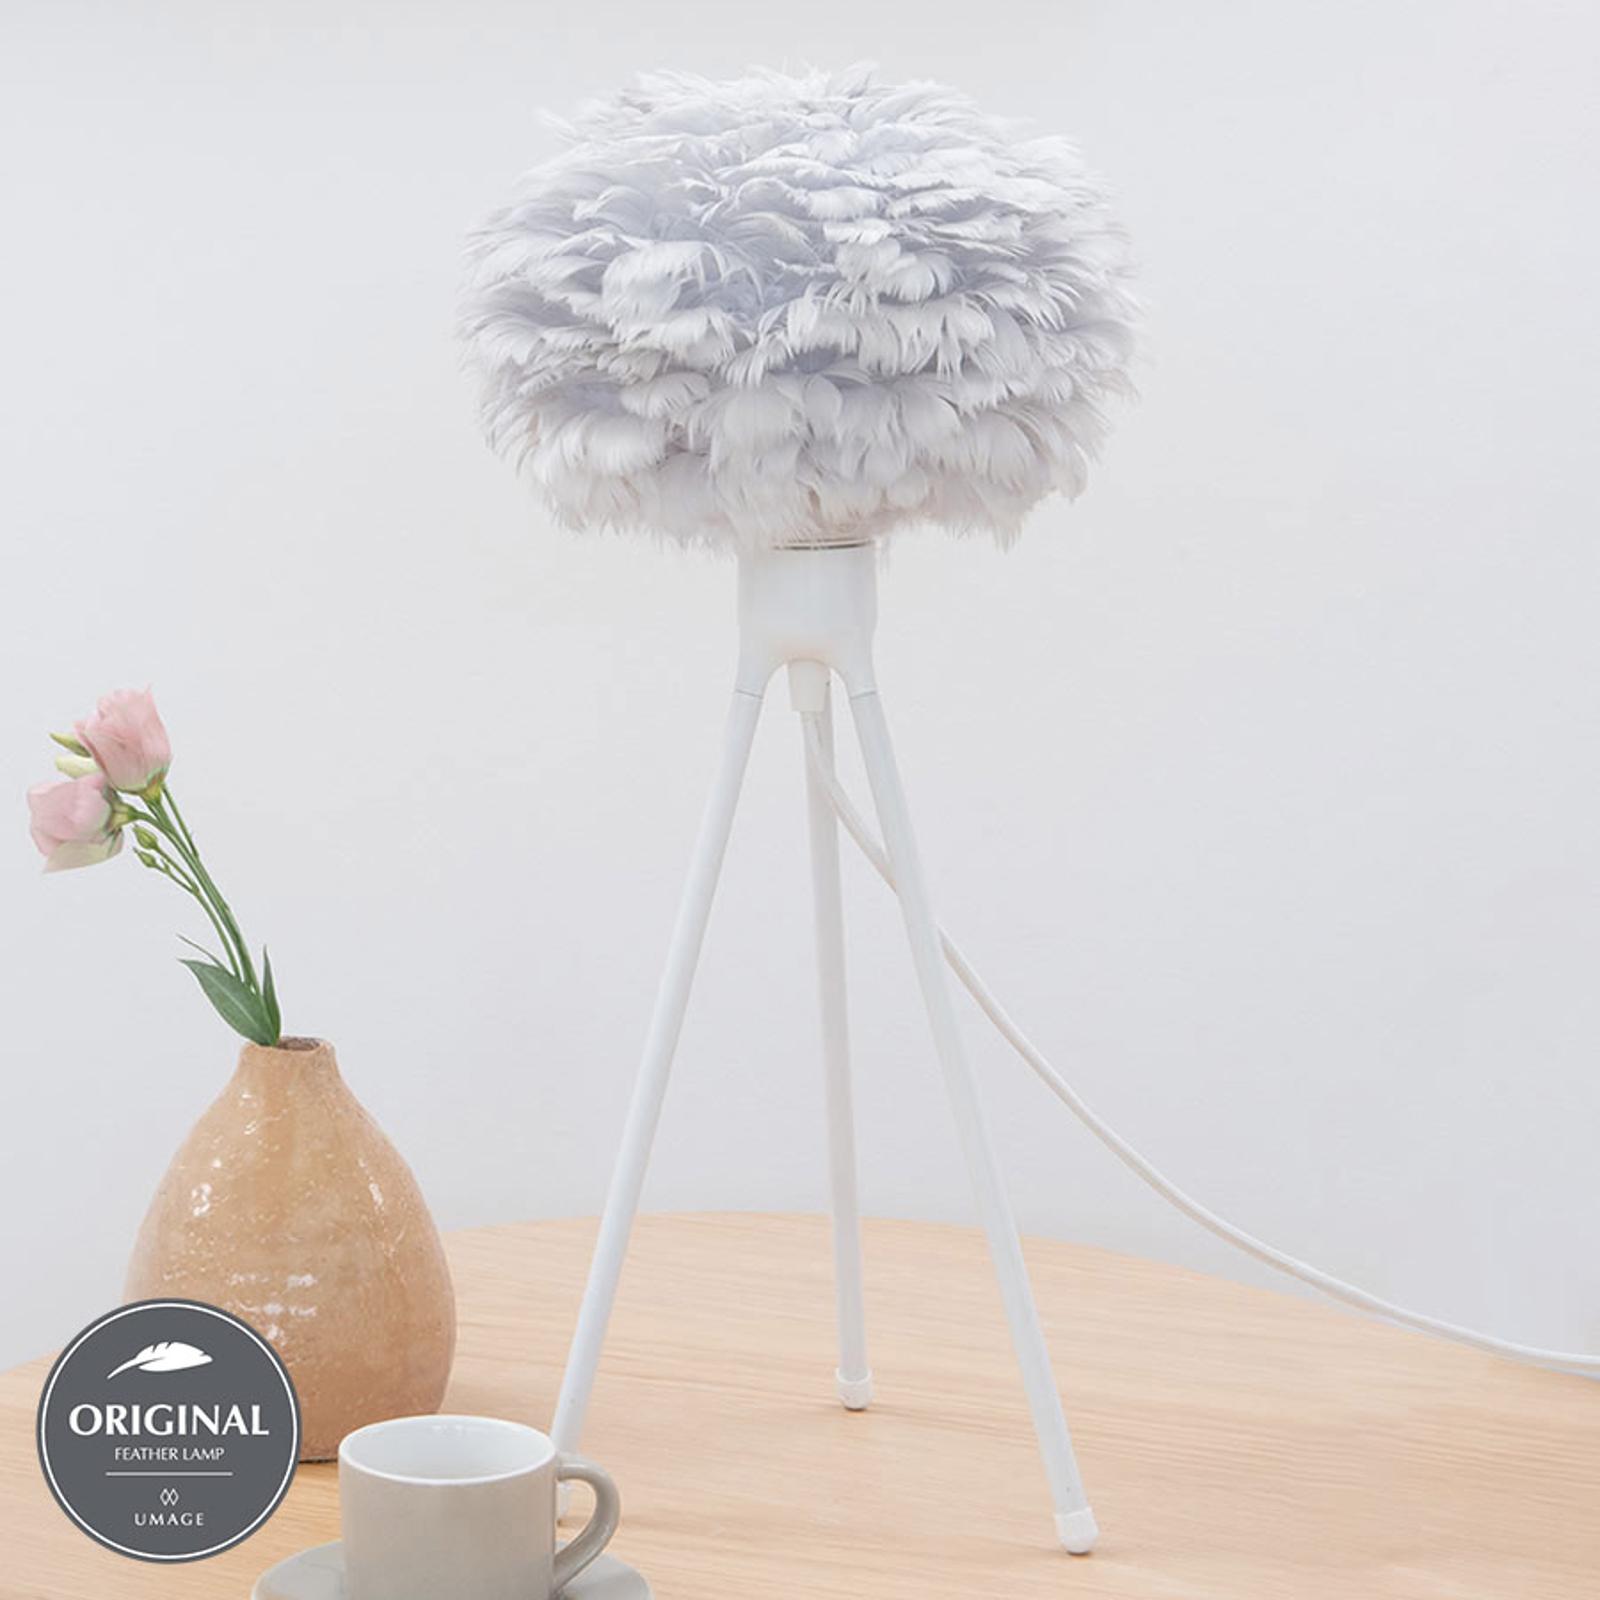 UMAGE Eos micro bordlampe, grå fjer